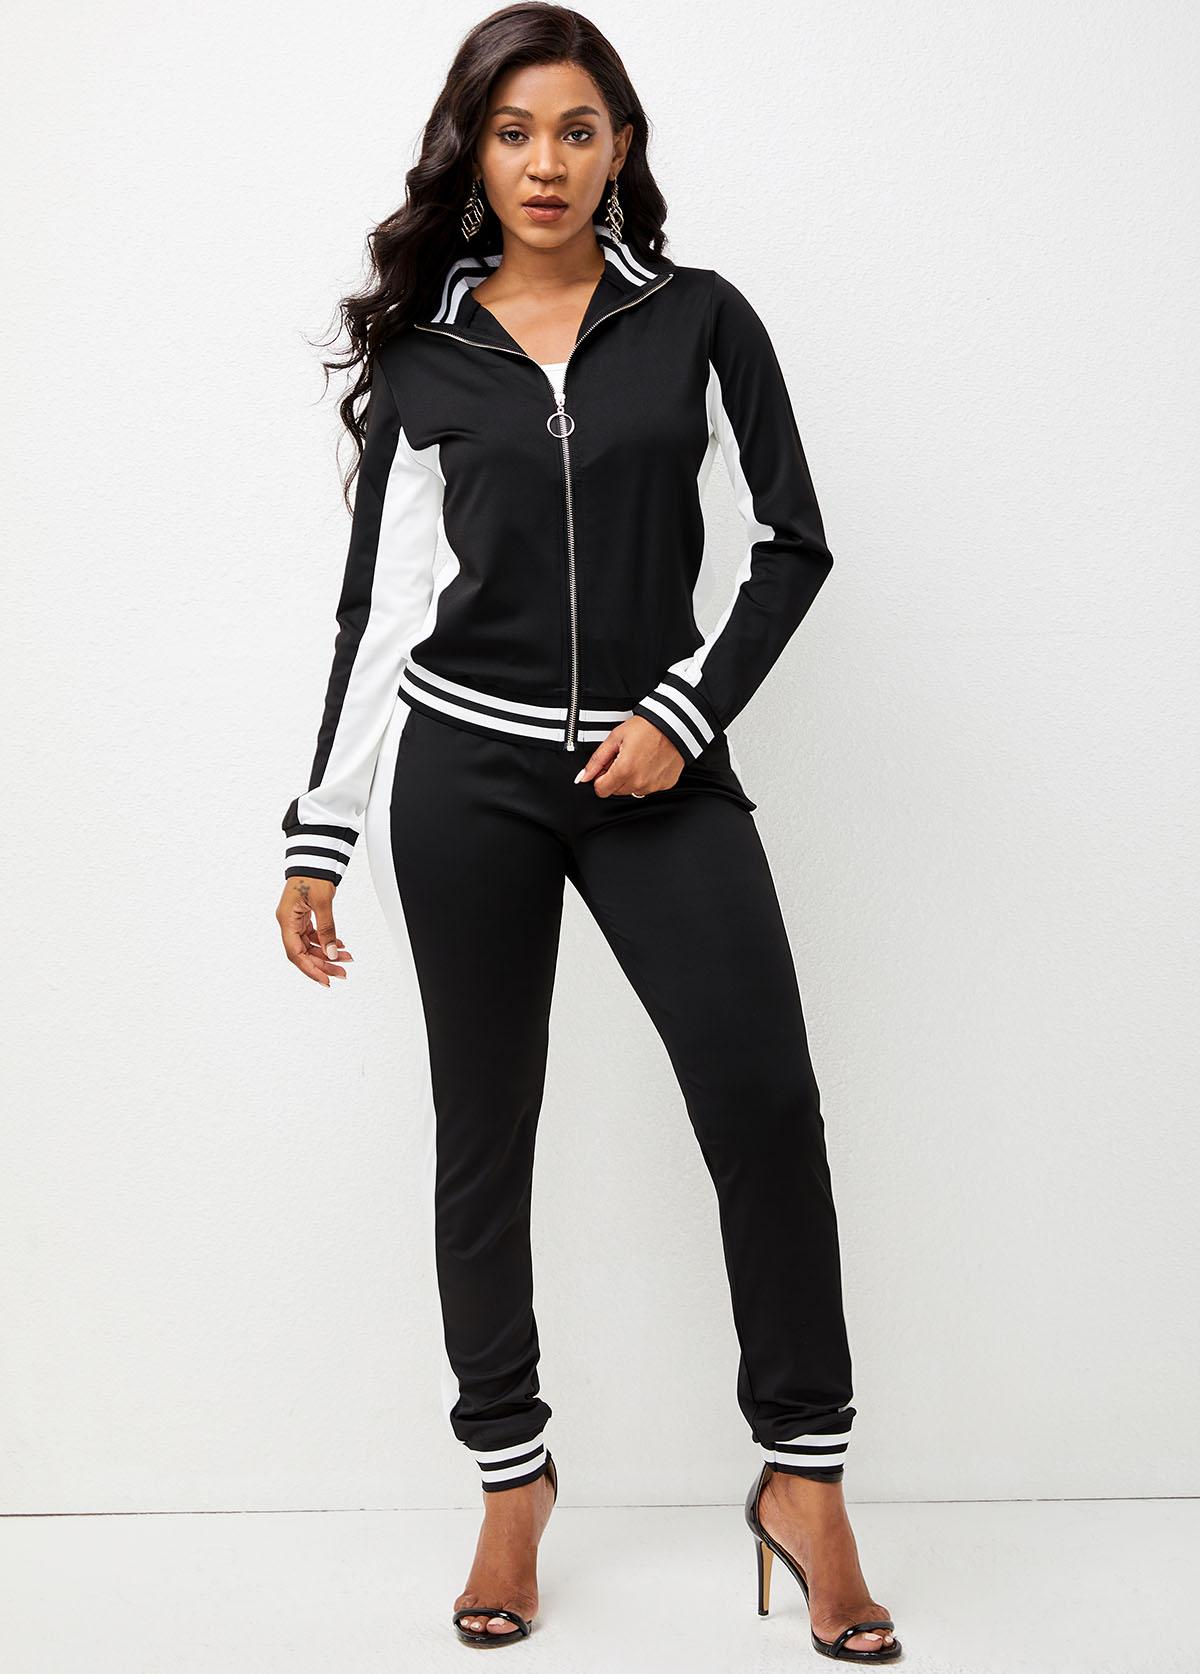 Striped Zipper Closure Long Sleeve Sweatsuit